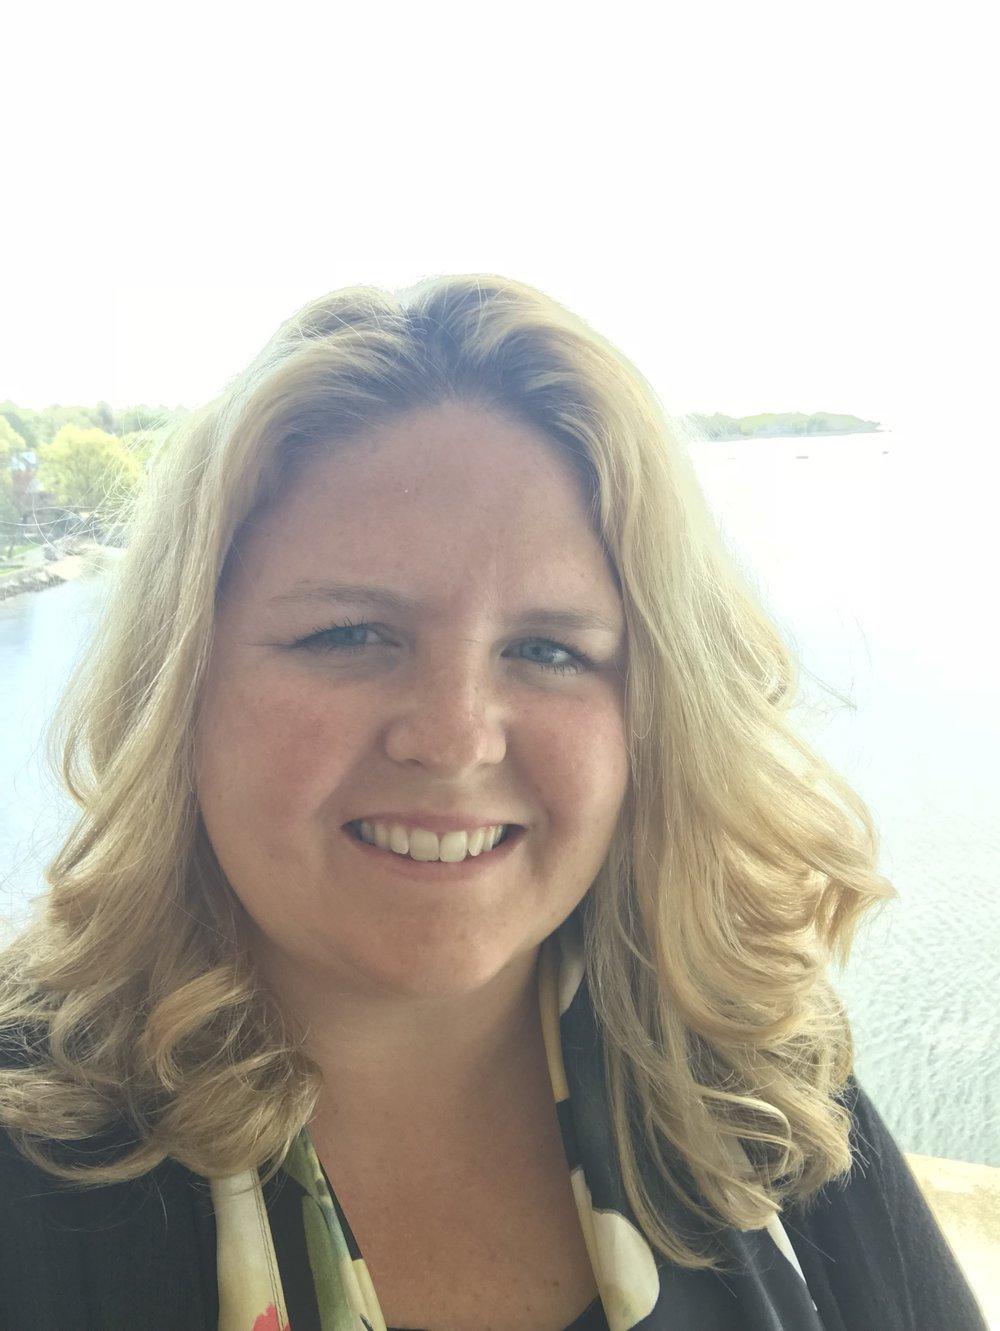 Lisa Kotasek - Homeplace WisdomFounder